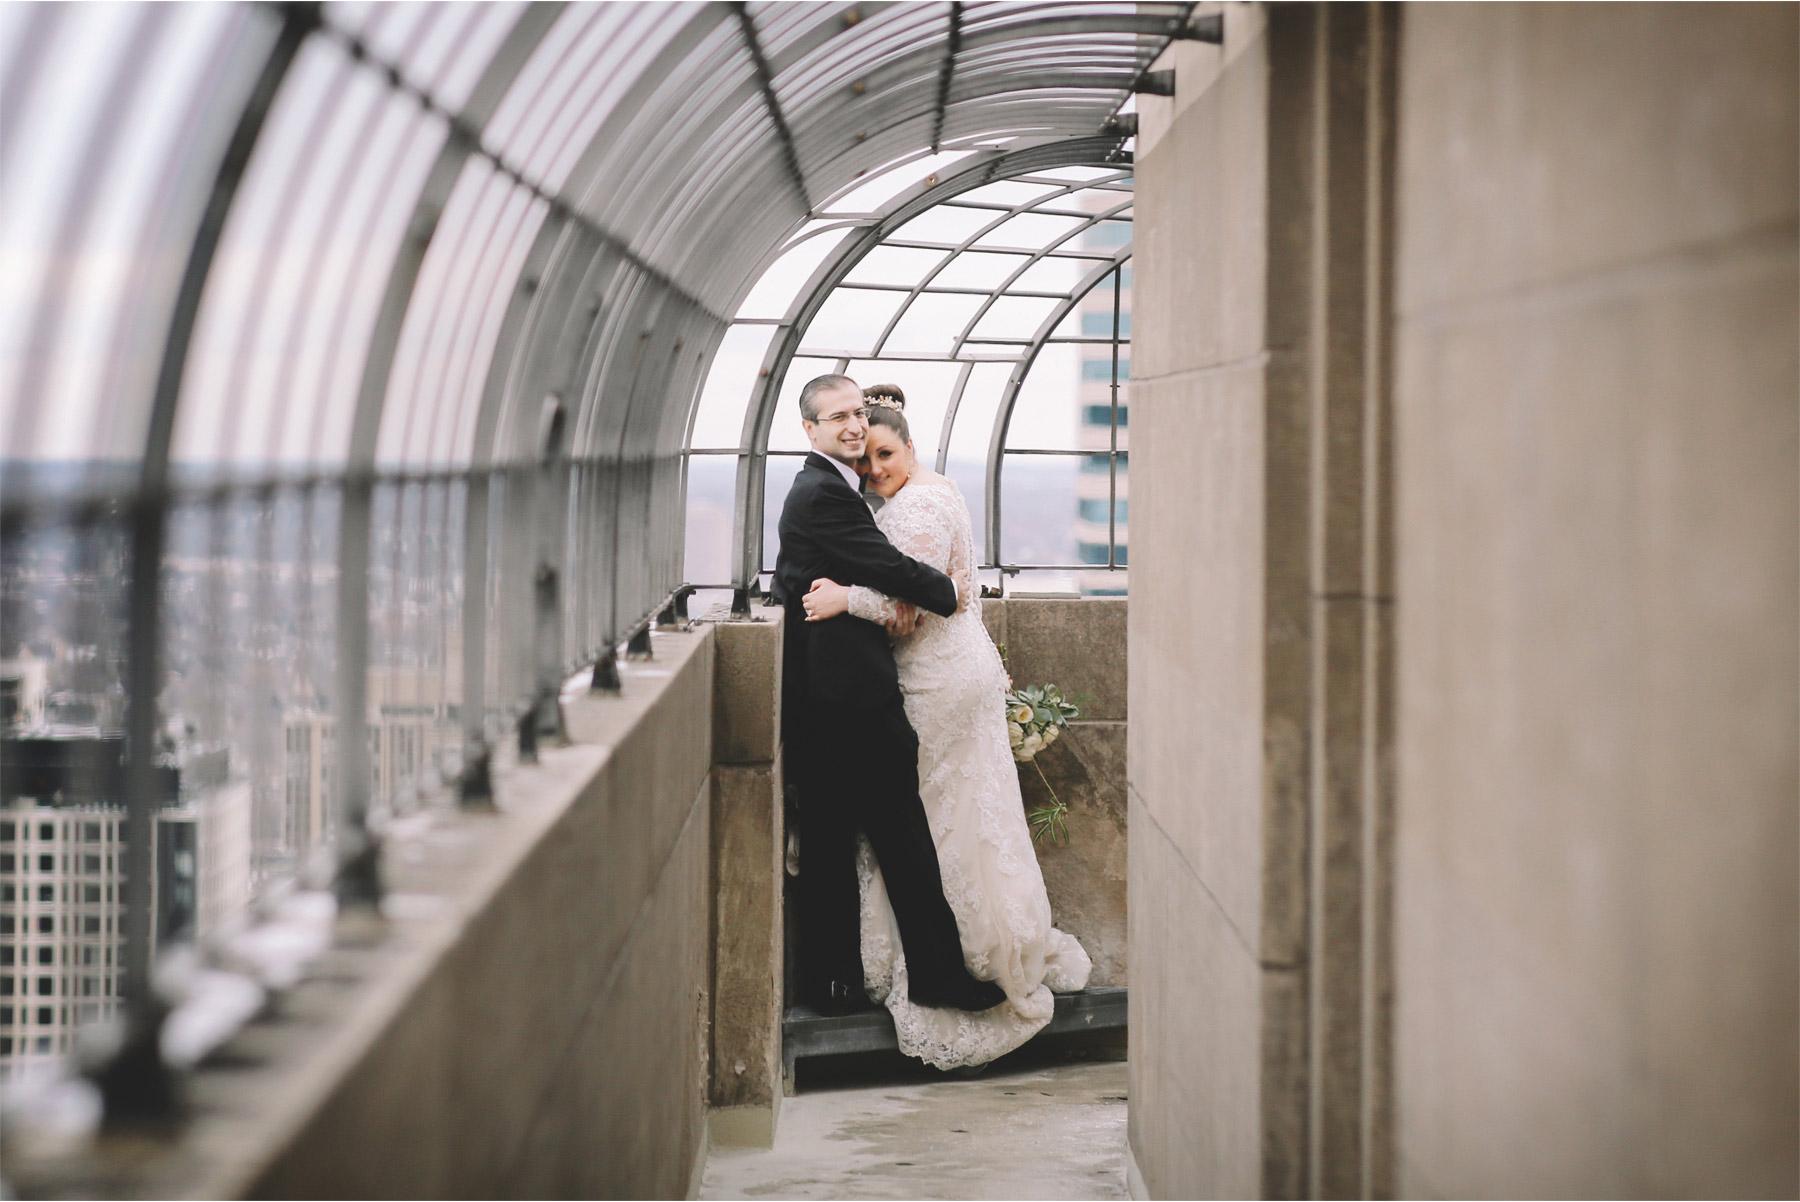 04-Minneapolis-Minnesota-Wedding-Photography-by-Vick-Photography-Foshay-Skyline-Anja-and-Waseem.jpg